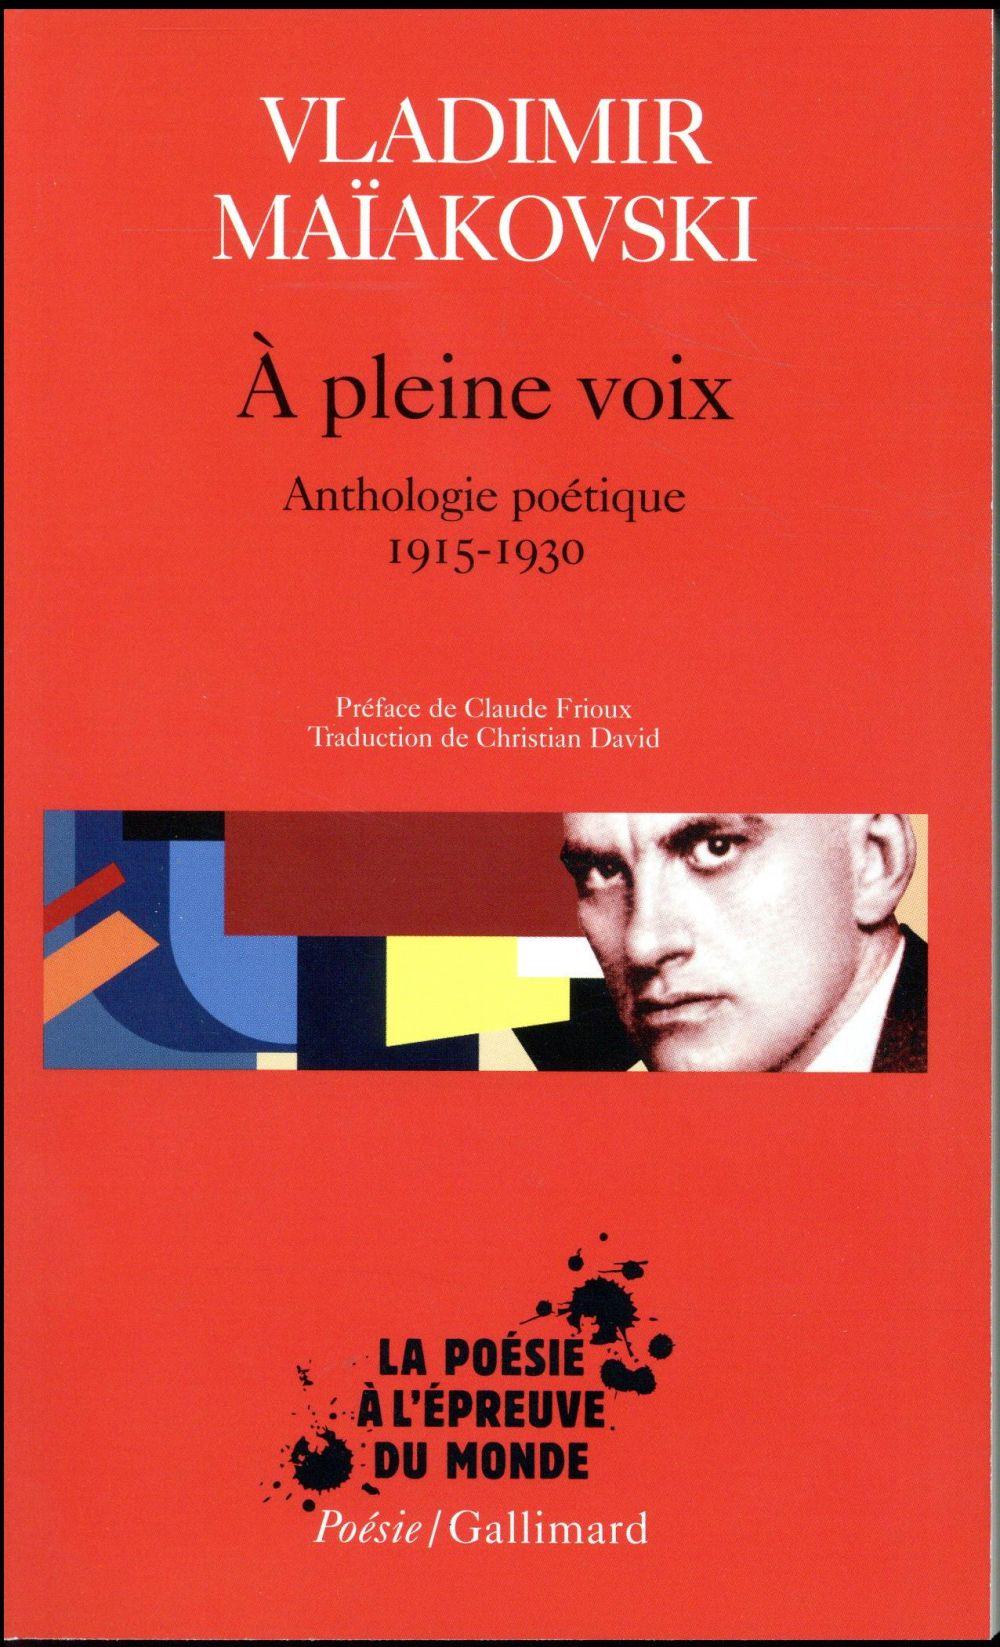 A PLEINE VOIX - ANTHOLOGIE POETIQUE 1915-1930